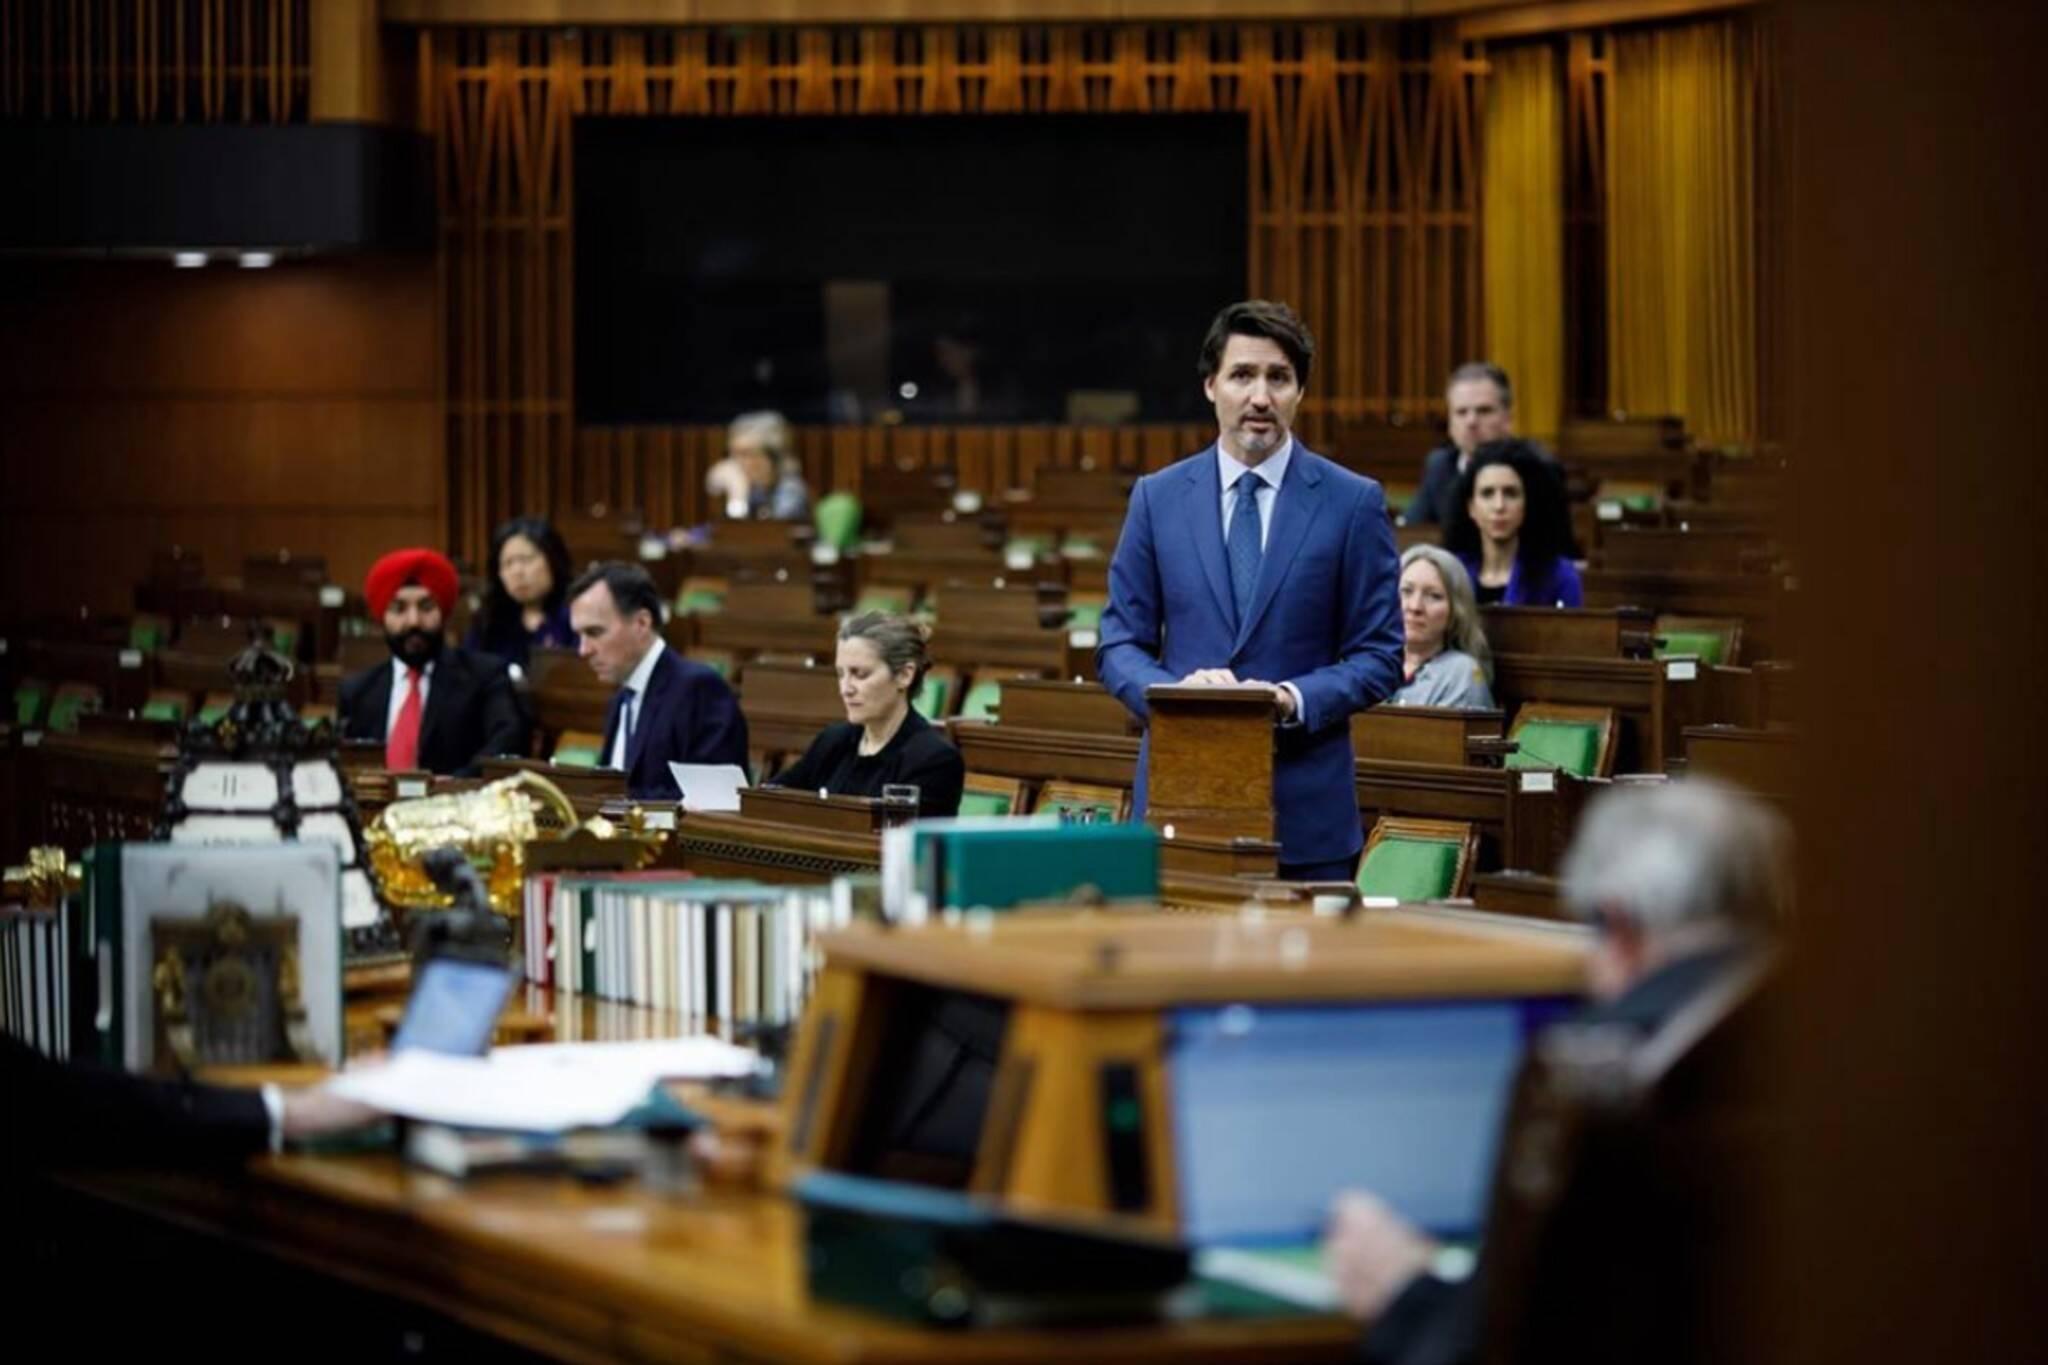 prorogue parliament